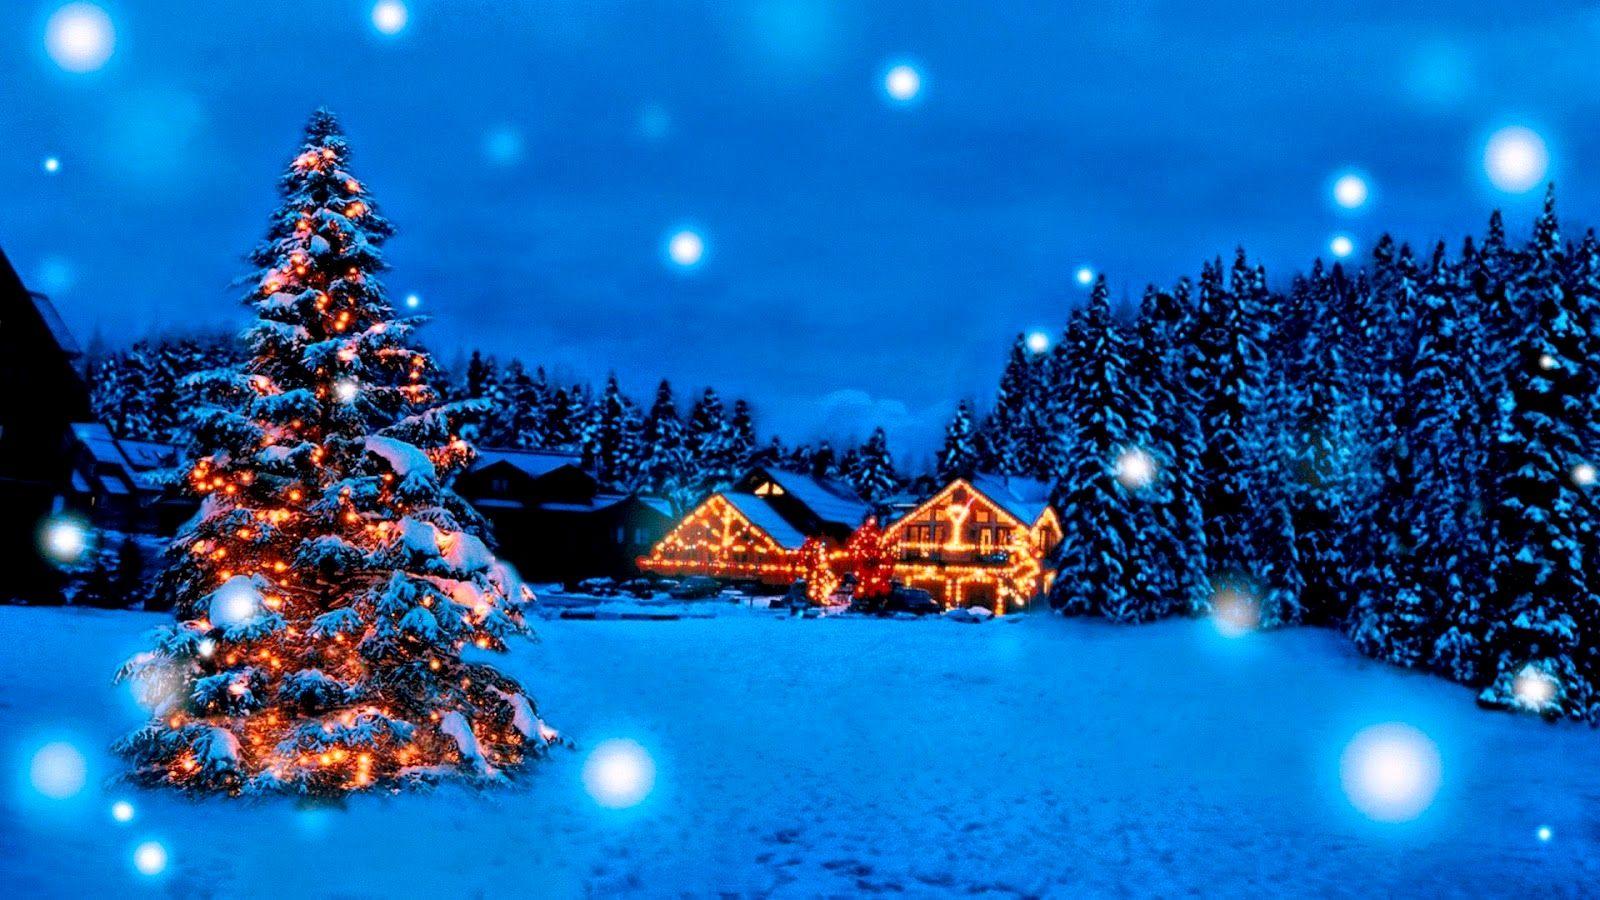 Christmas Wallpaper Desktop Ideas Kertas Dinding Natal Latar Belakang Natal Gambar Selamat Natal